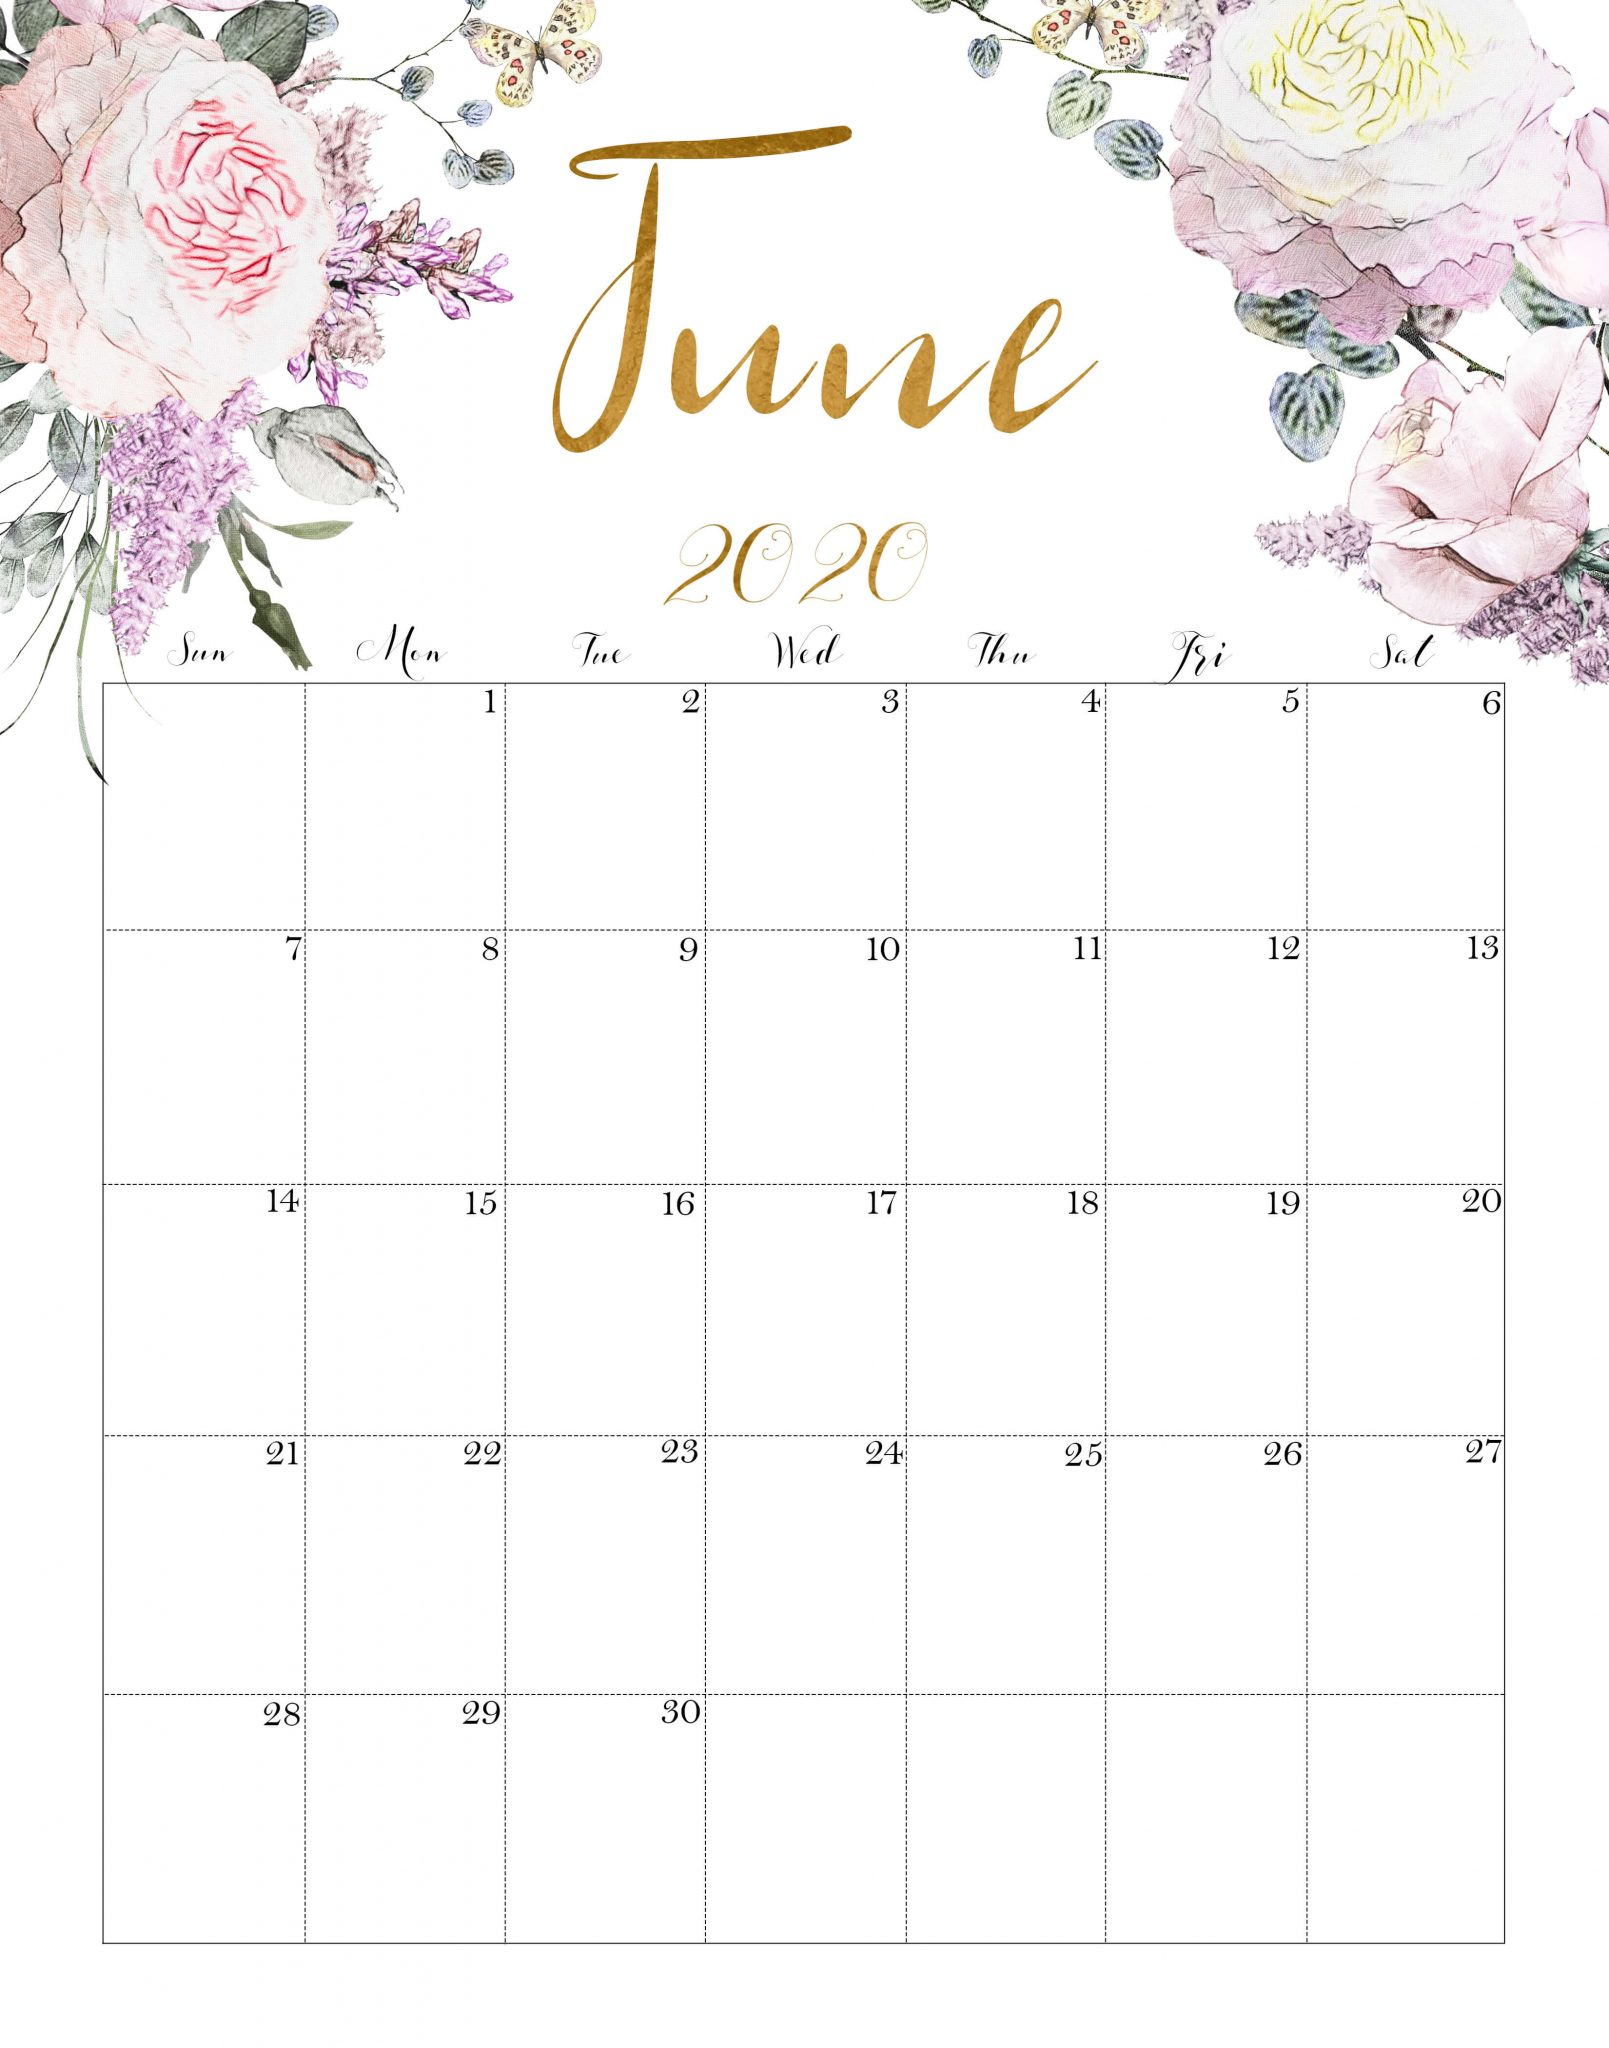 Floral June 2020 Calendar Printable